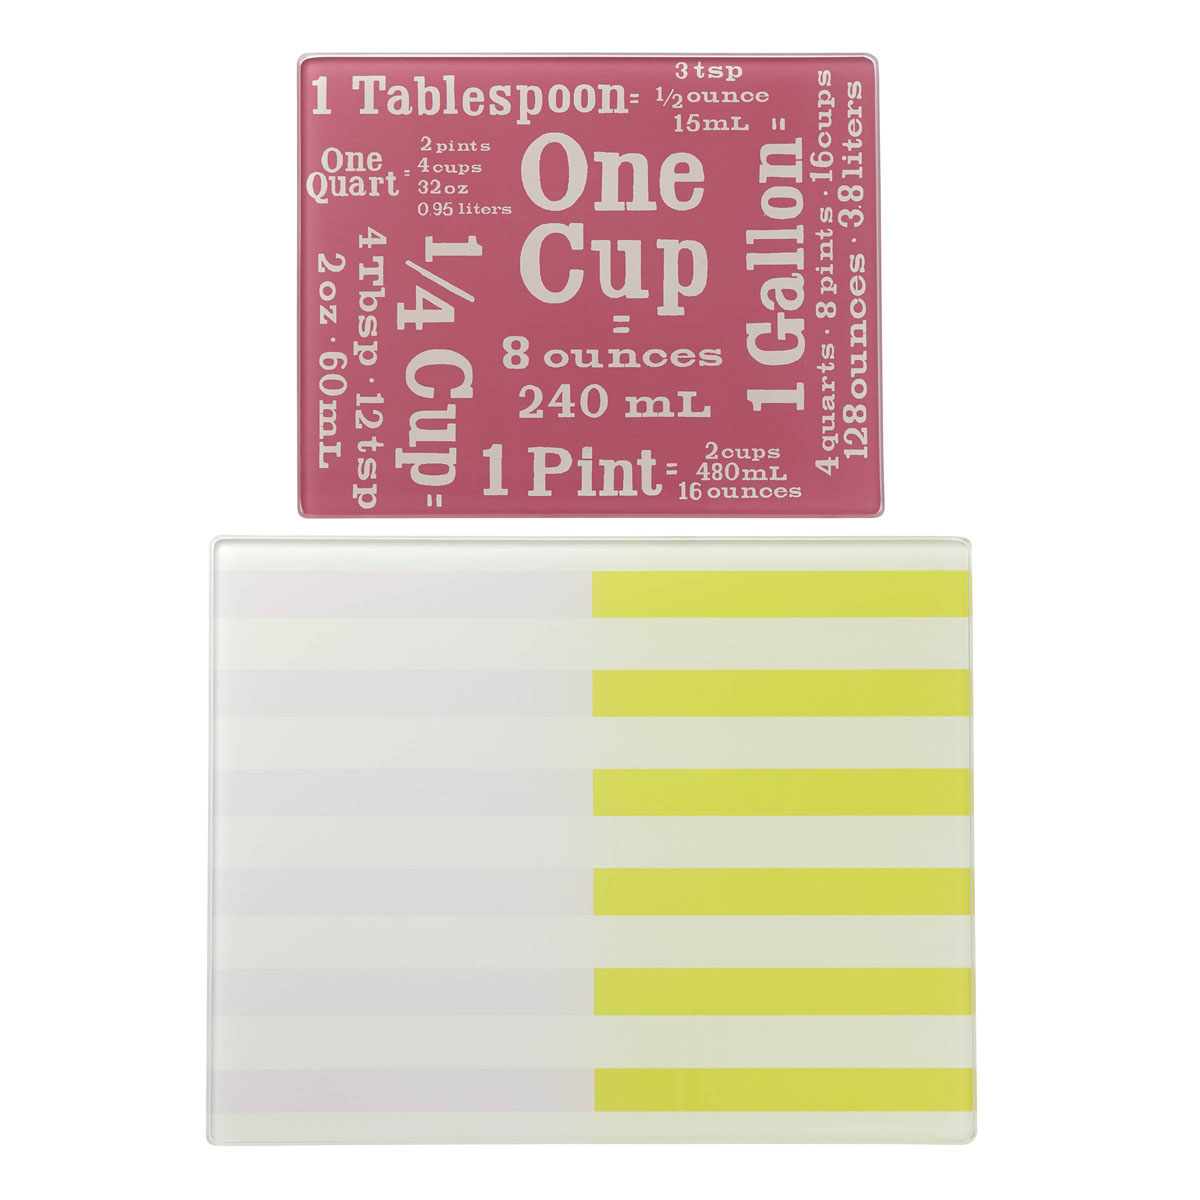 Kate Spade New York, Lenox Nolita Blush Glass Prep Board, Set of 2